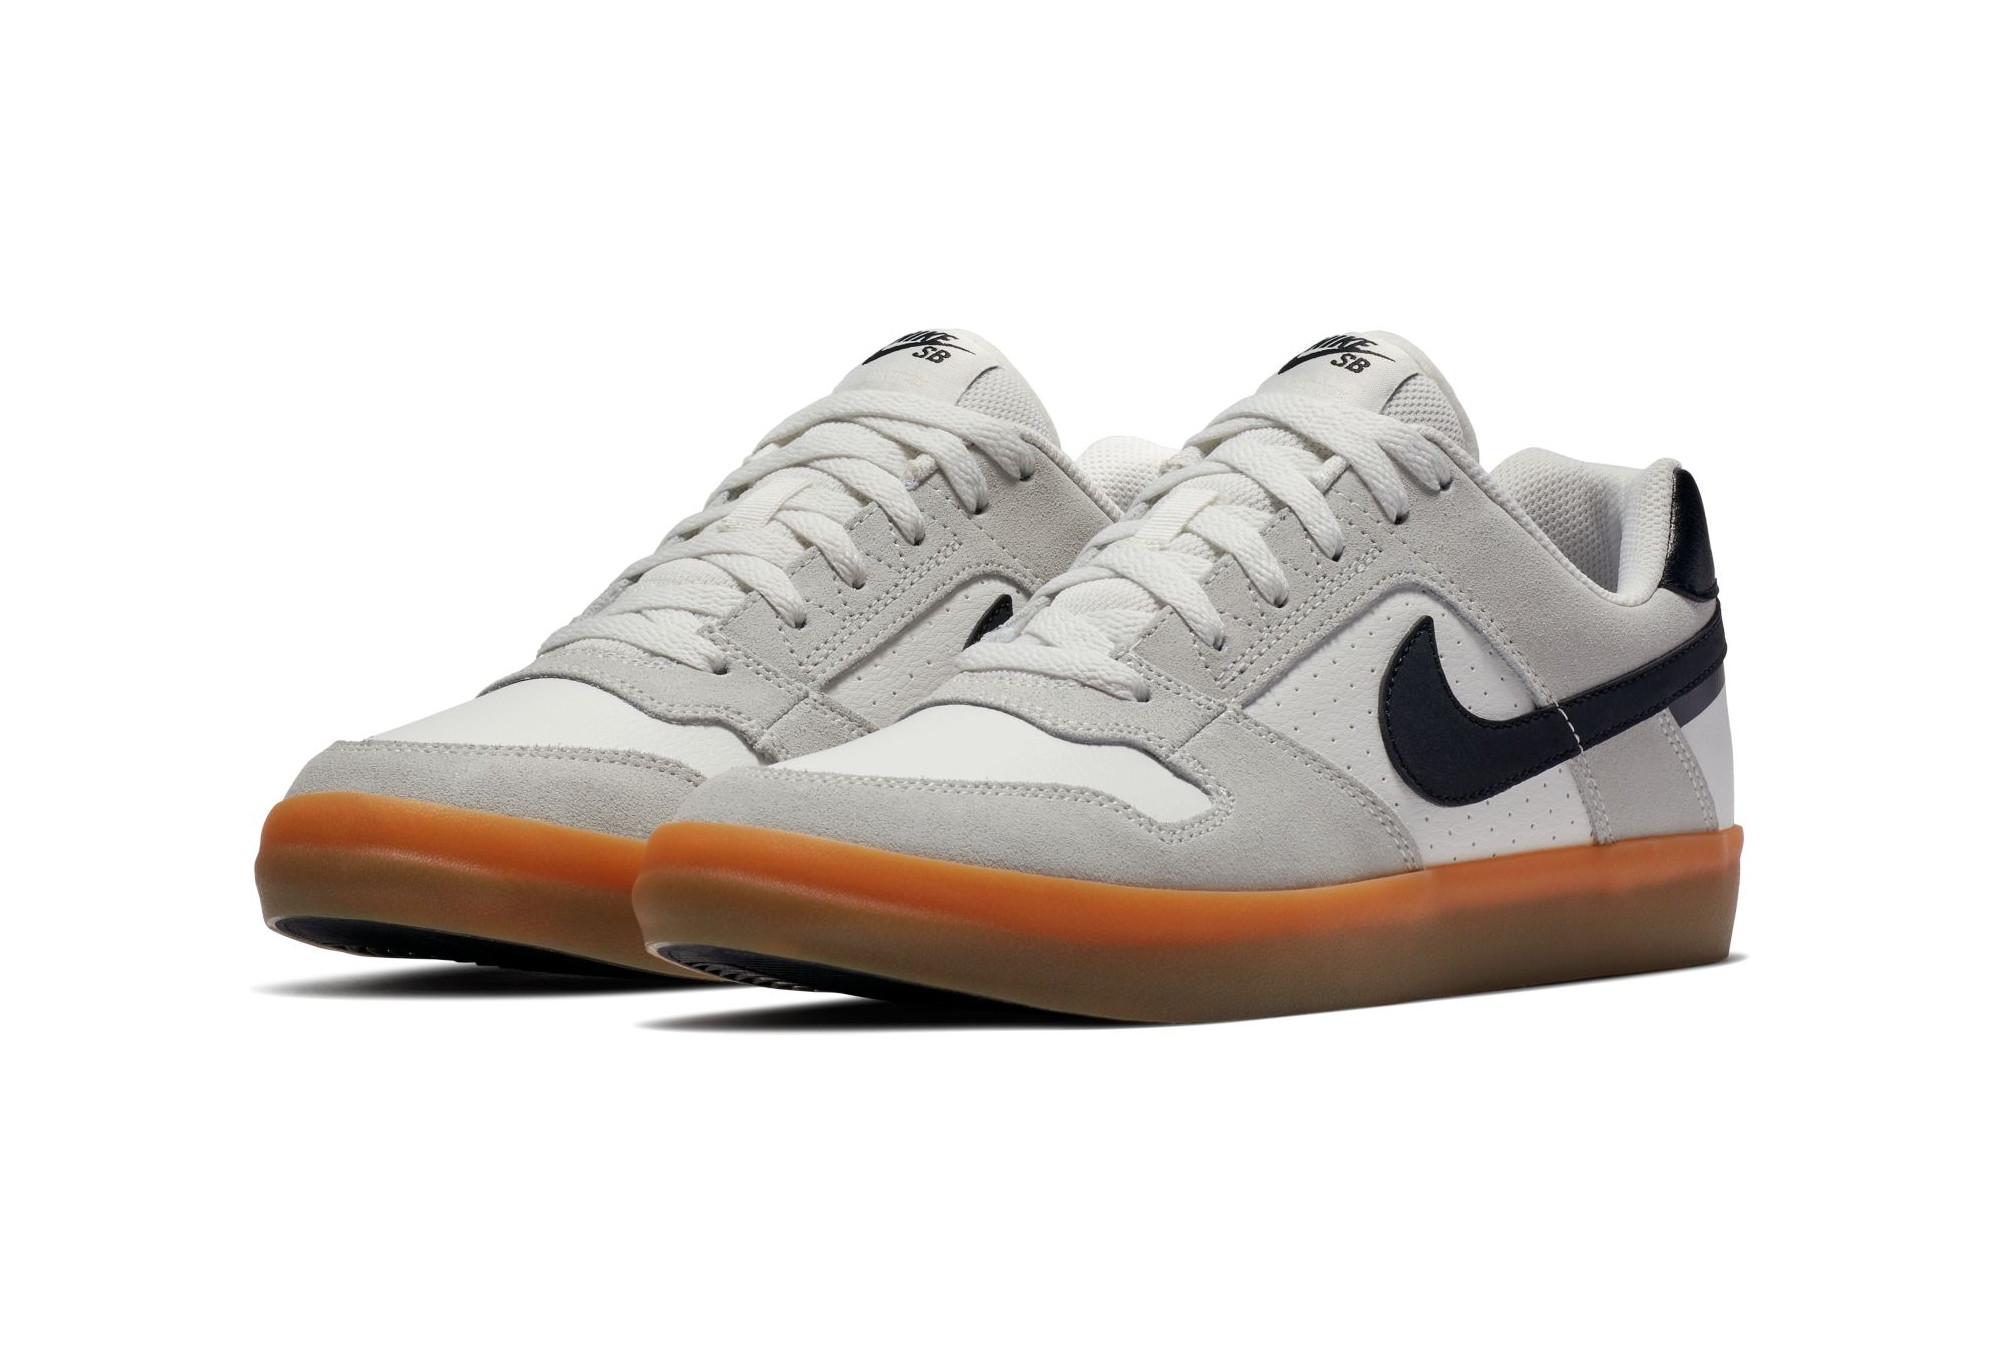 best website ccf94 51d5d Chaussures Nike SB Delta Force Vulc Blanc   Noir